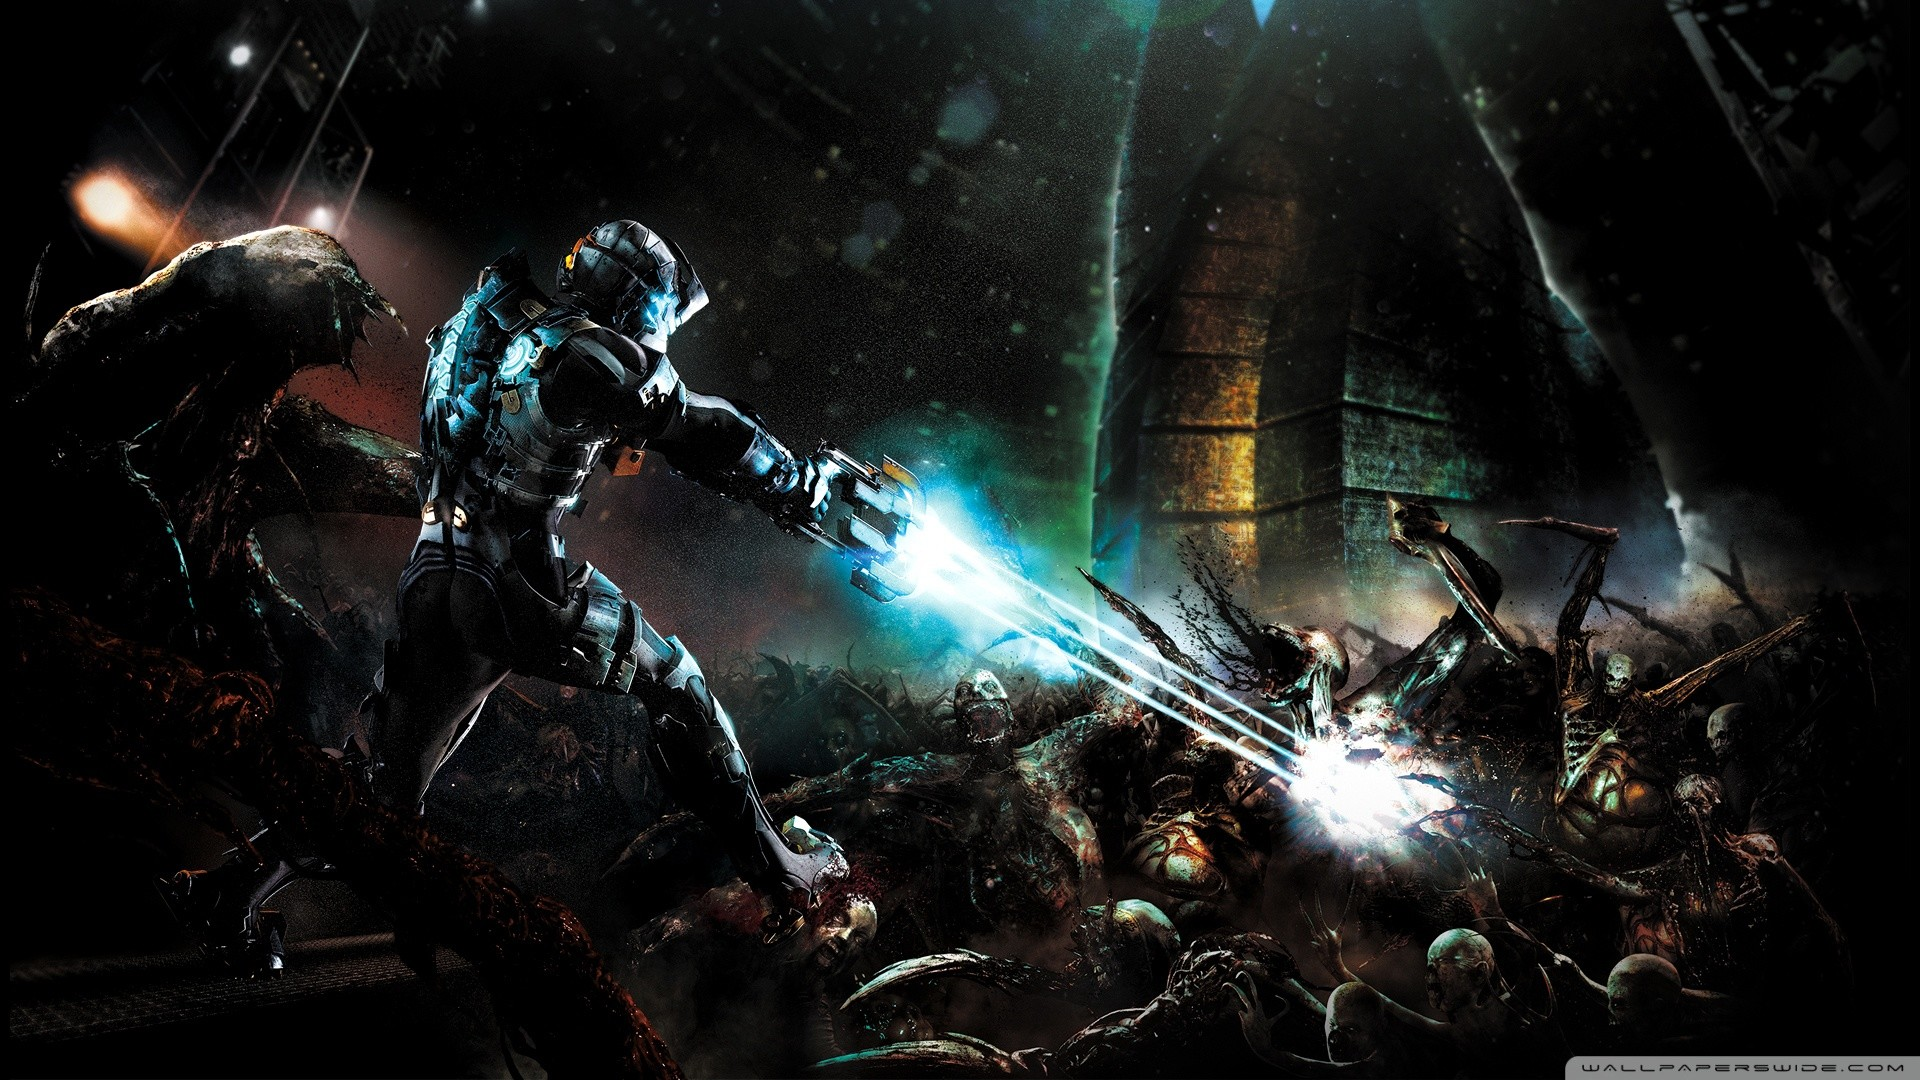 Dead Space 2 Wallpaper Hd 78 Images